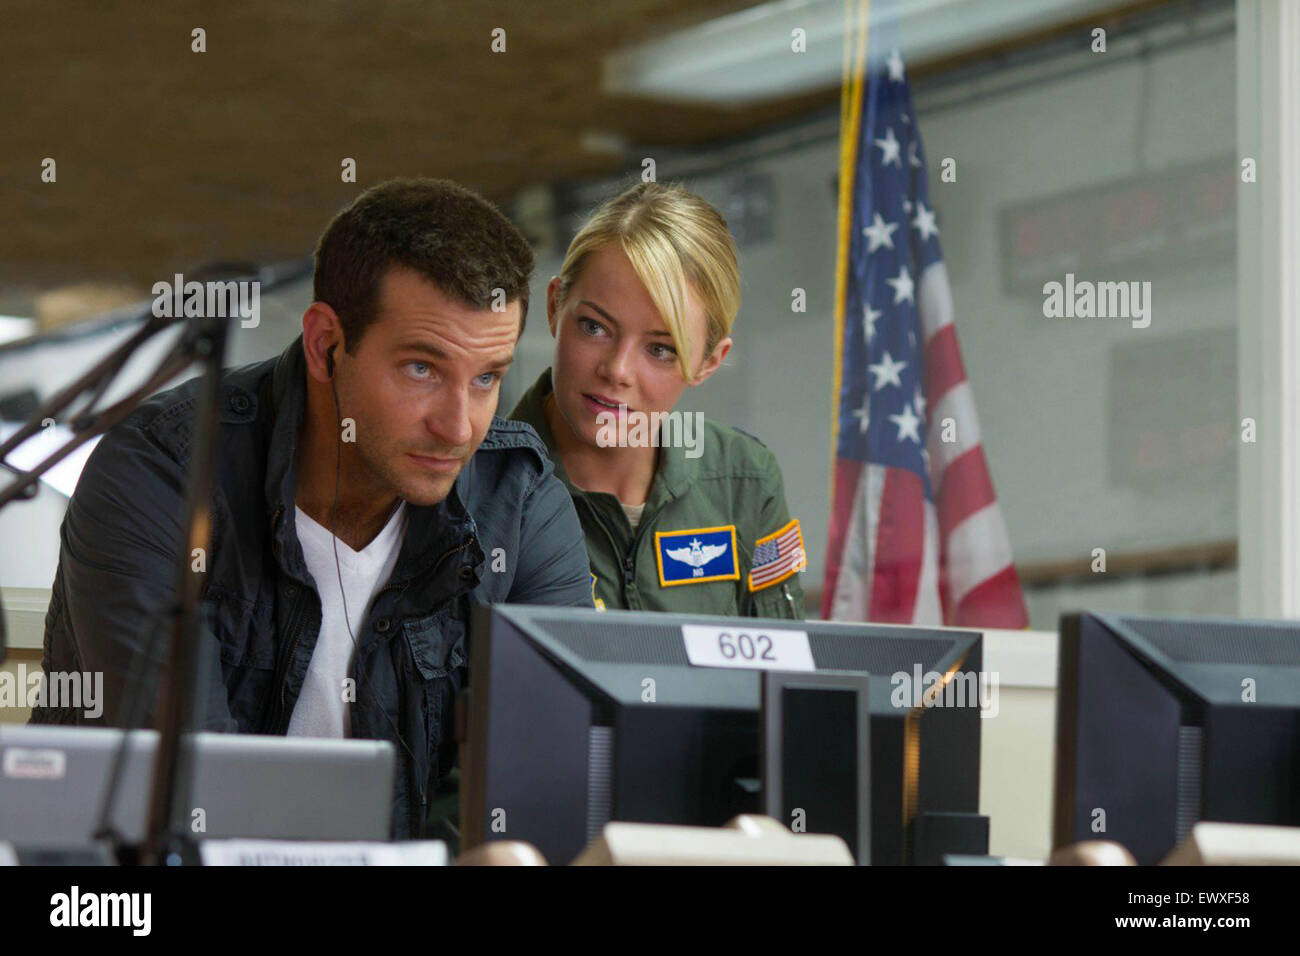 ALOHA (2015)  BRADLEY COOPER, EMMA STONE  CAMERON CROWE (DIR) - Stock Image